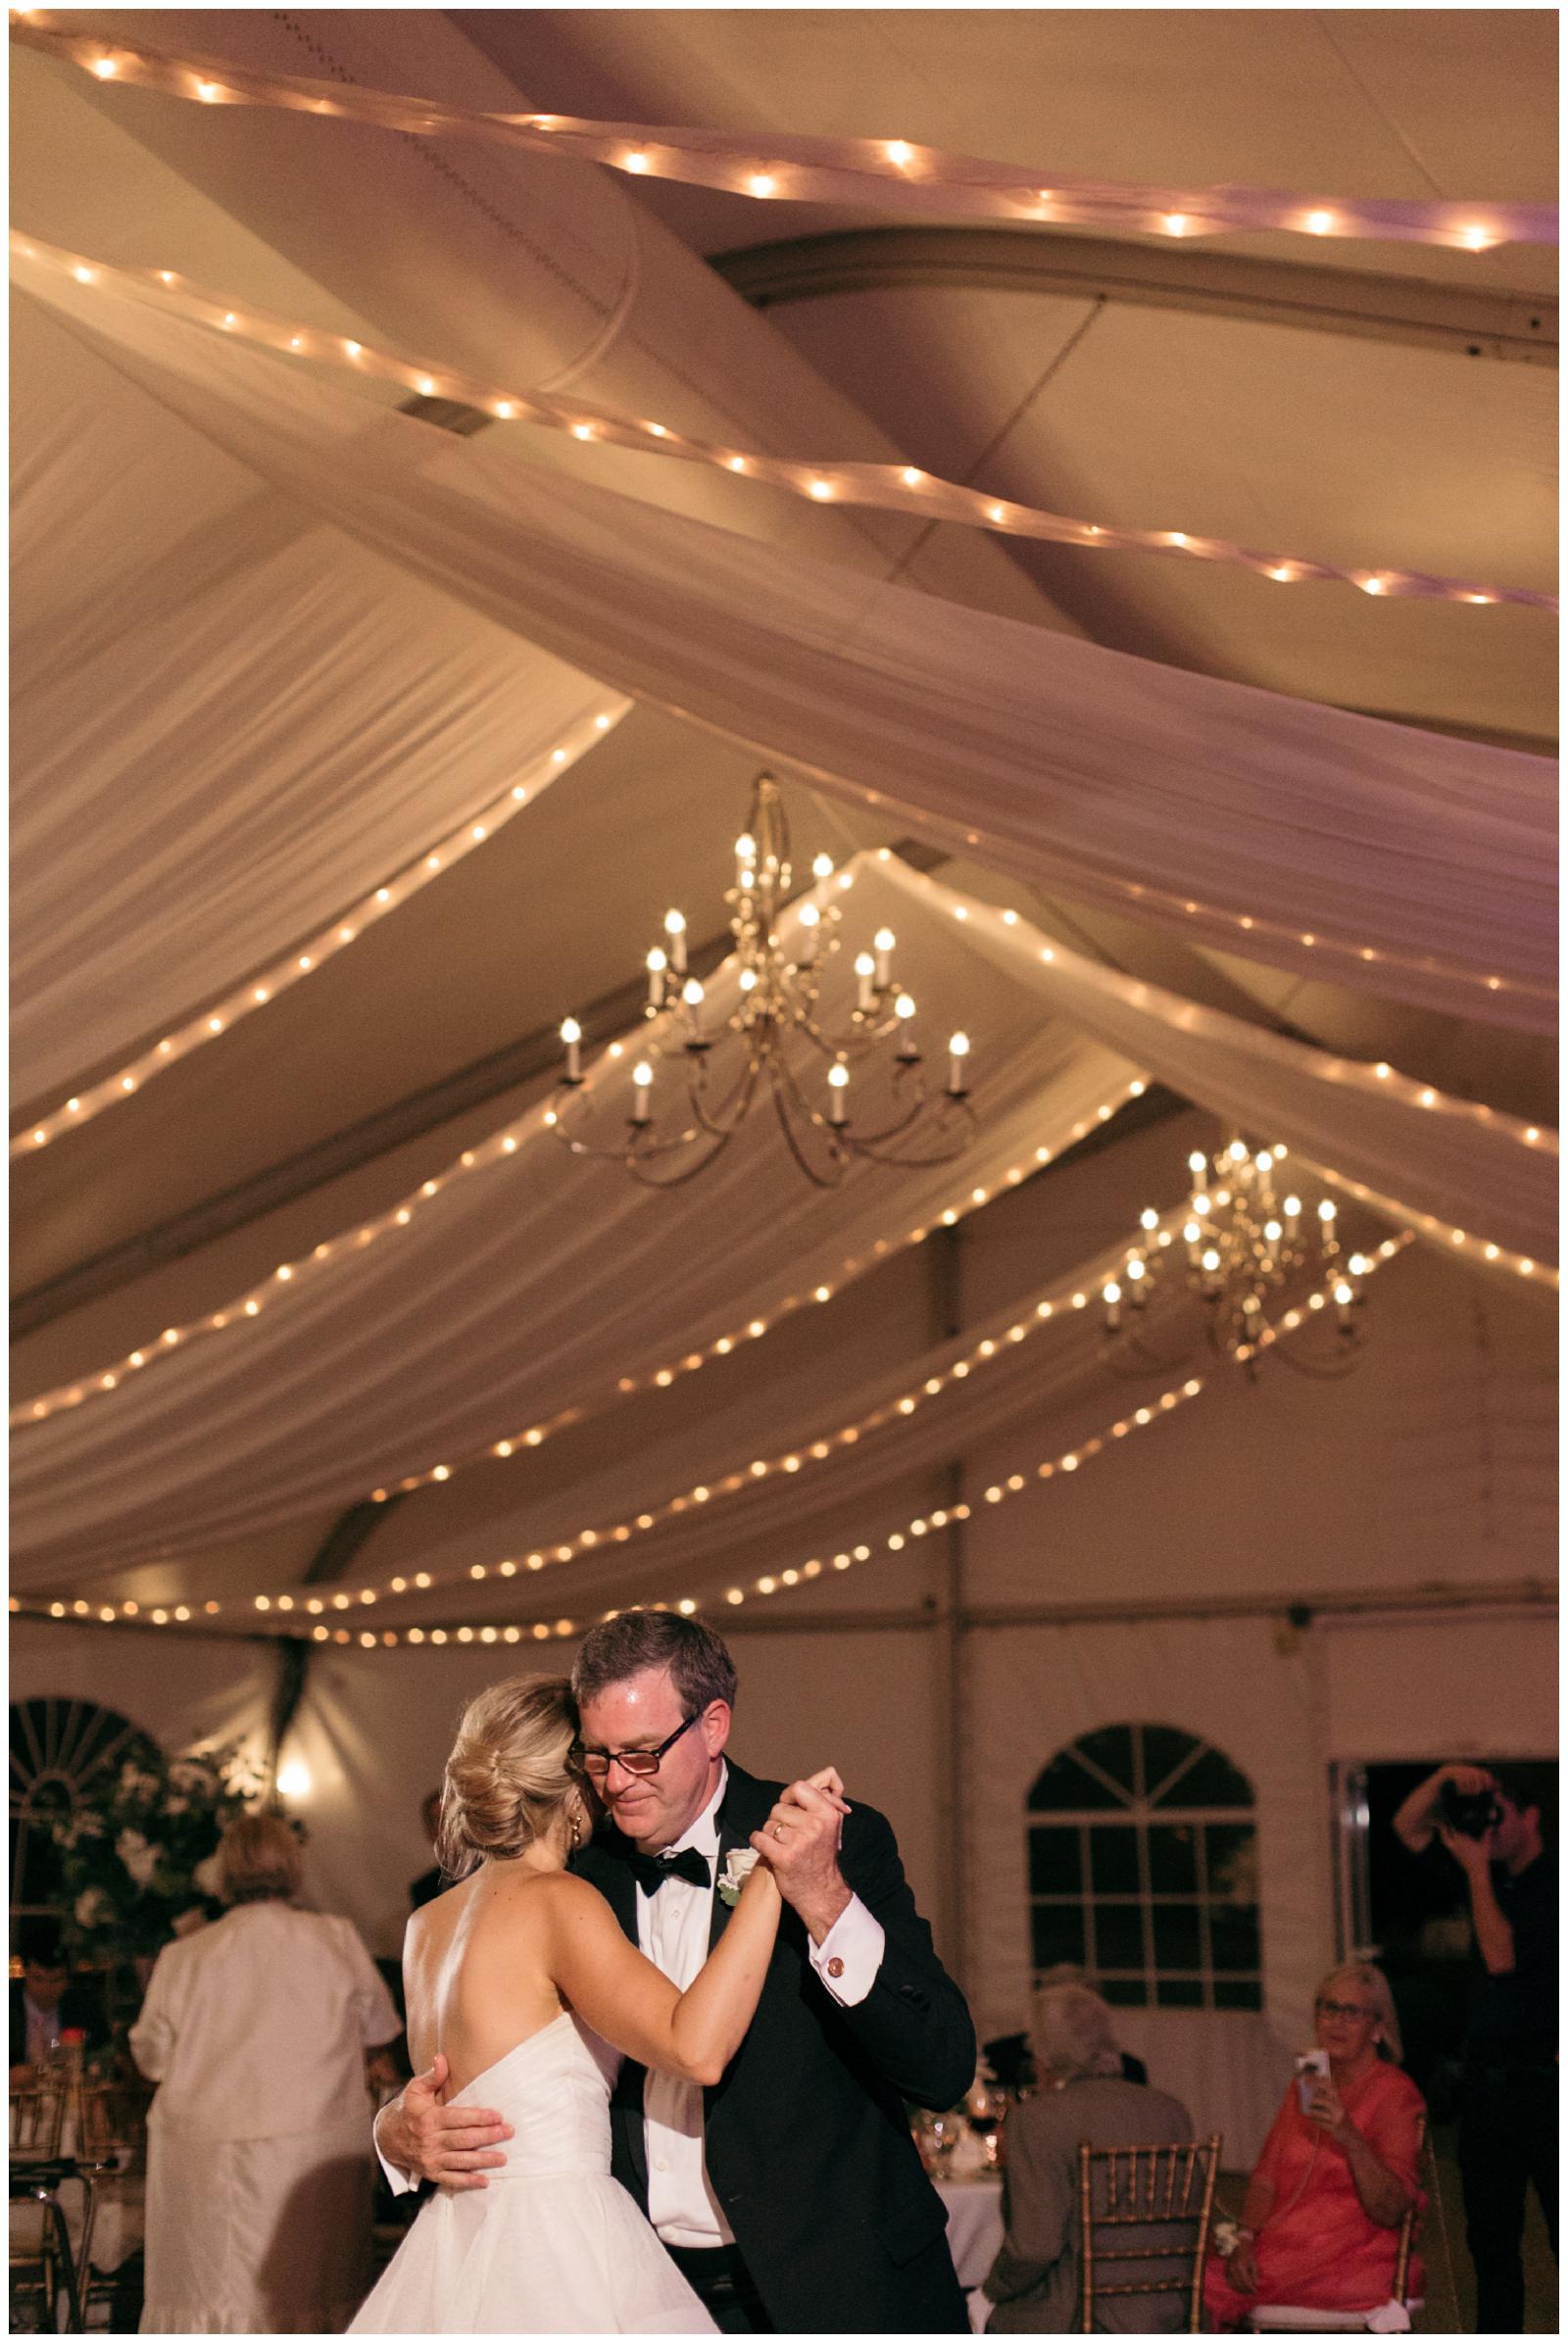 New England tented wedding